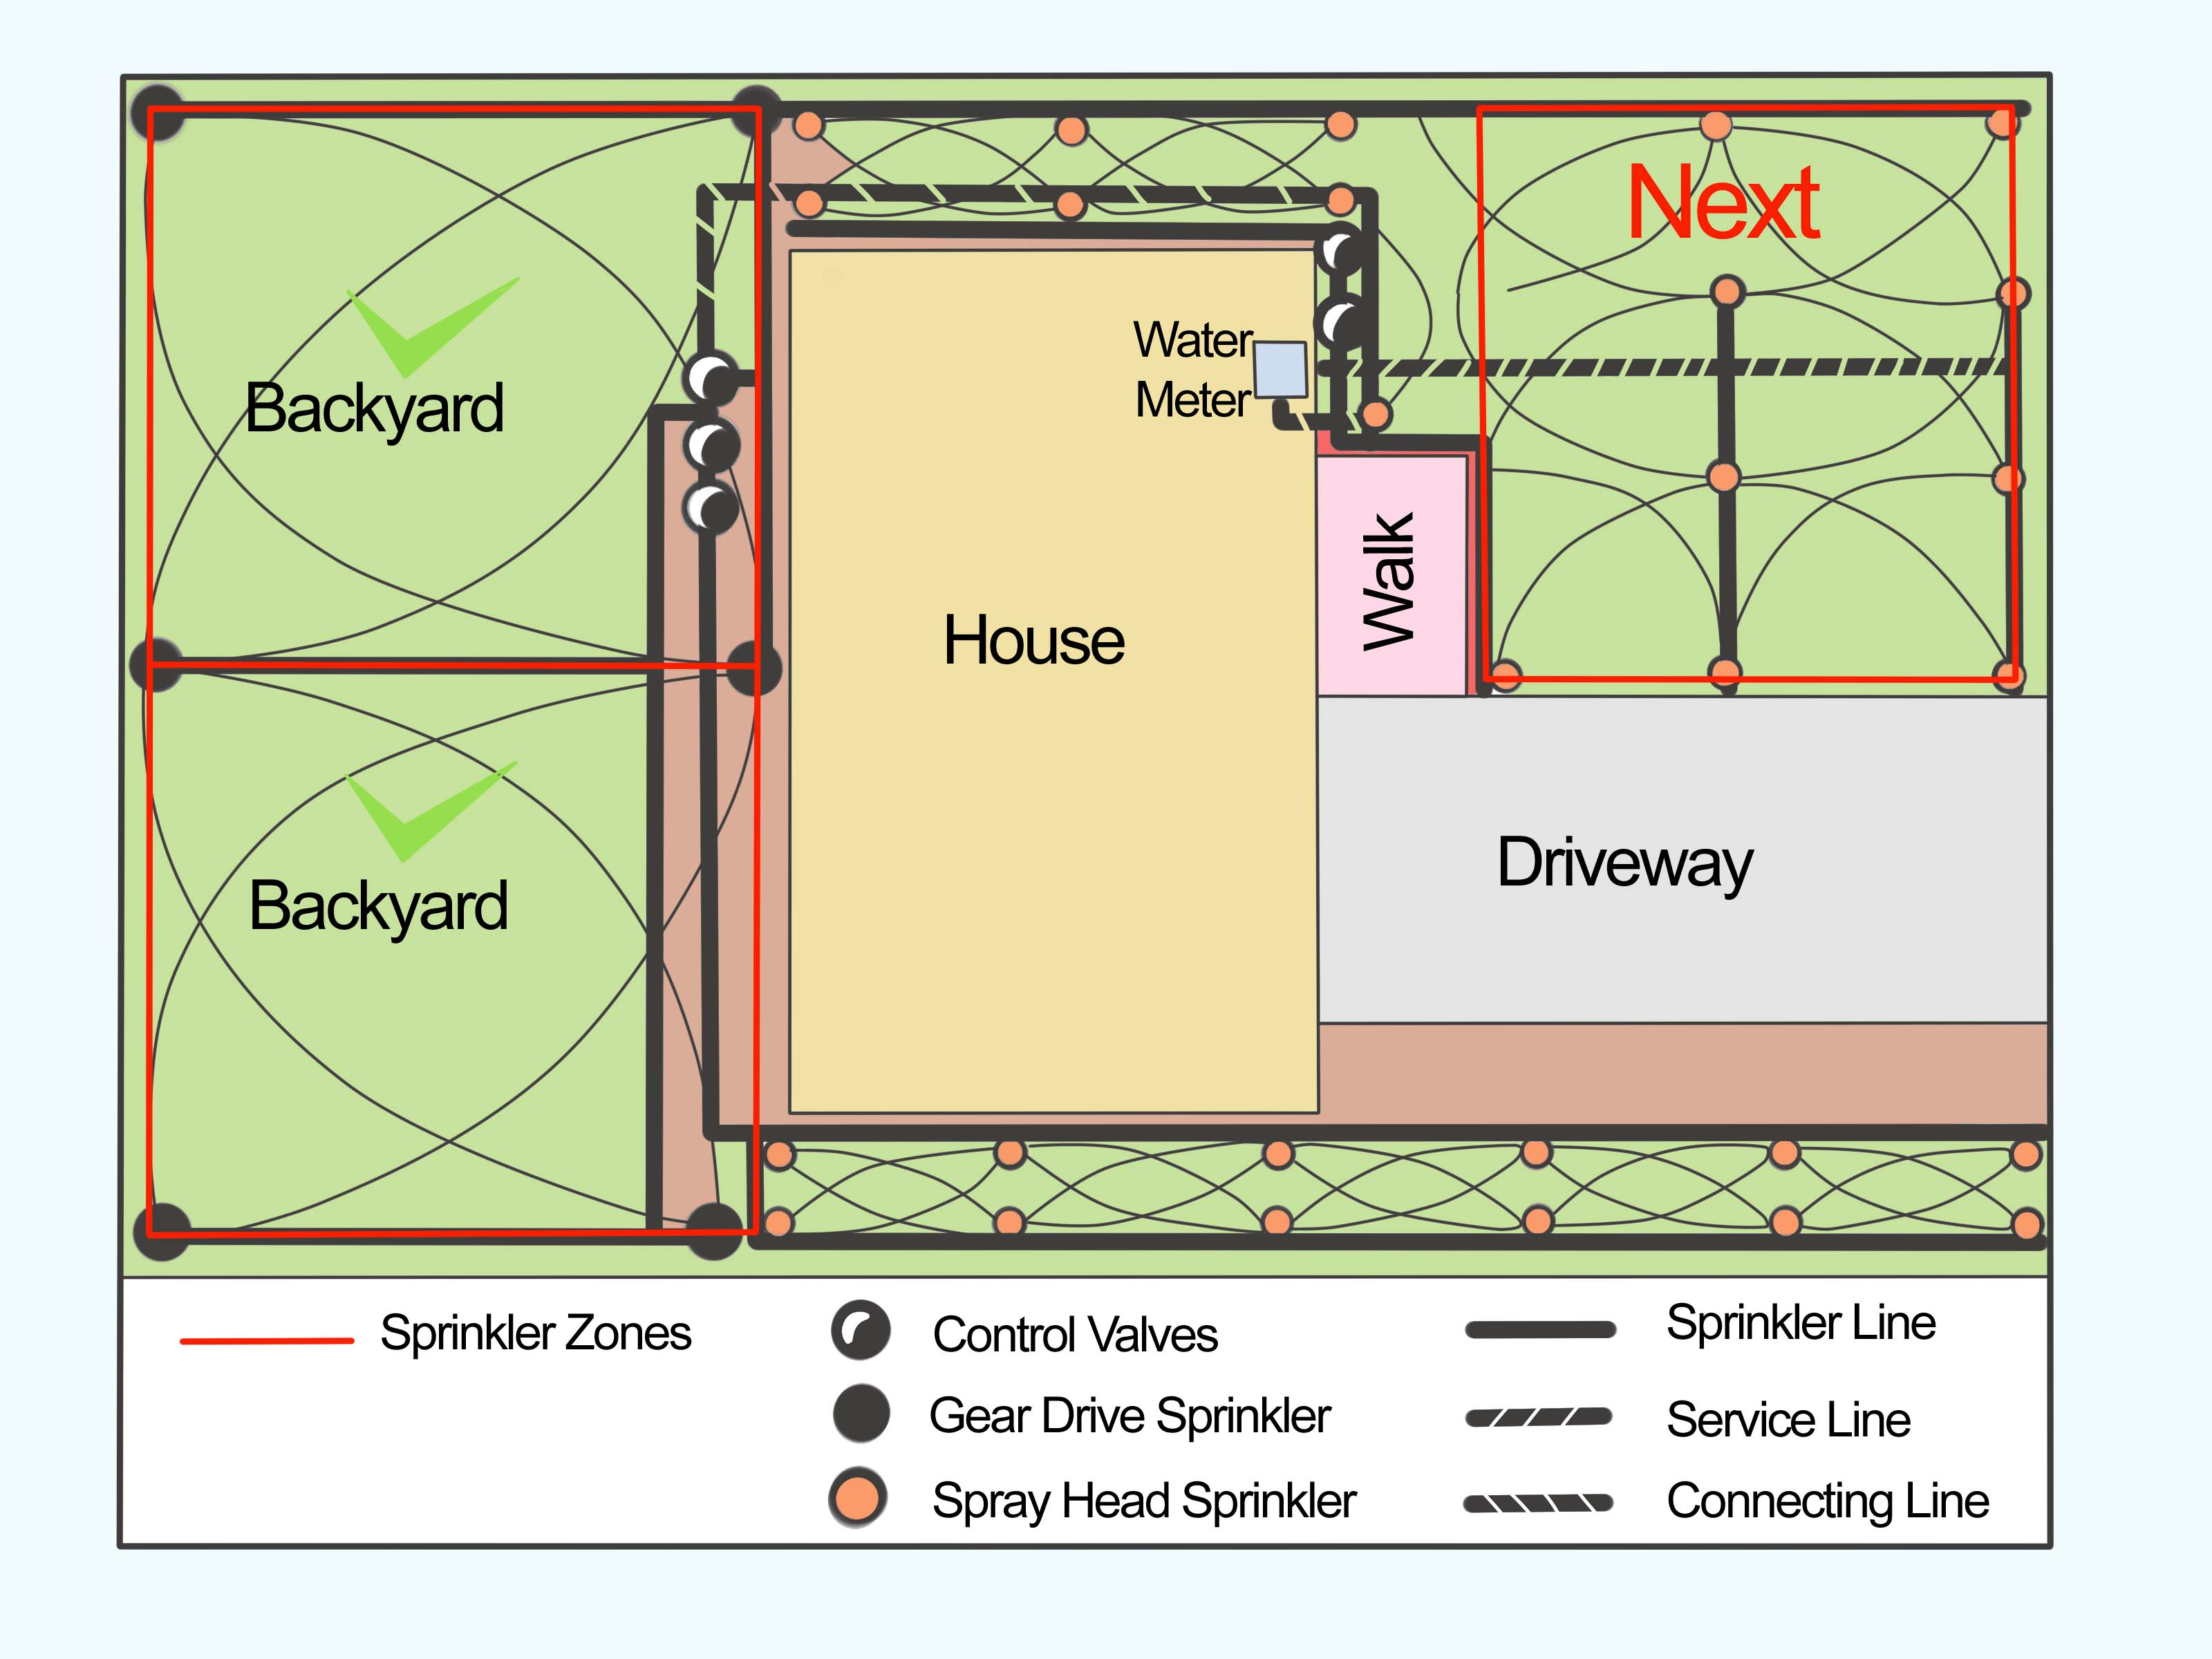 sprinkler system backflow preventer diagram car stereo speaker wiring diagrams for lawn sprinklers